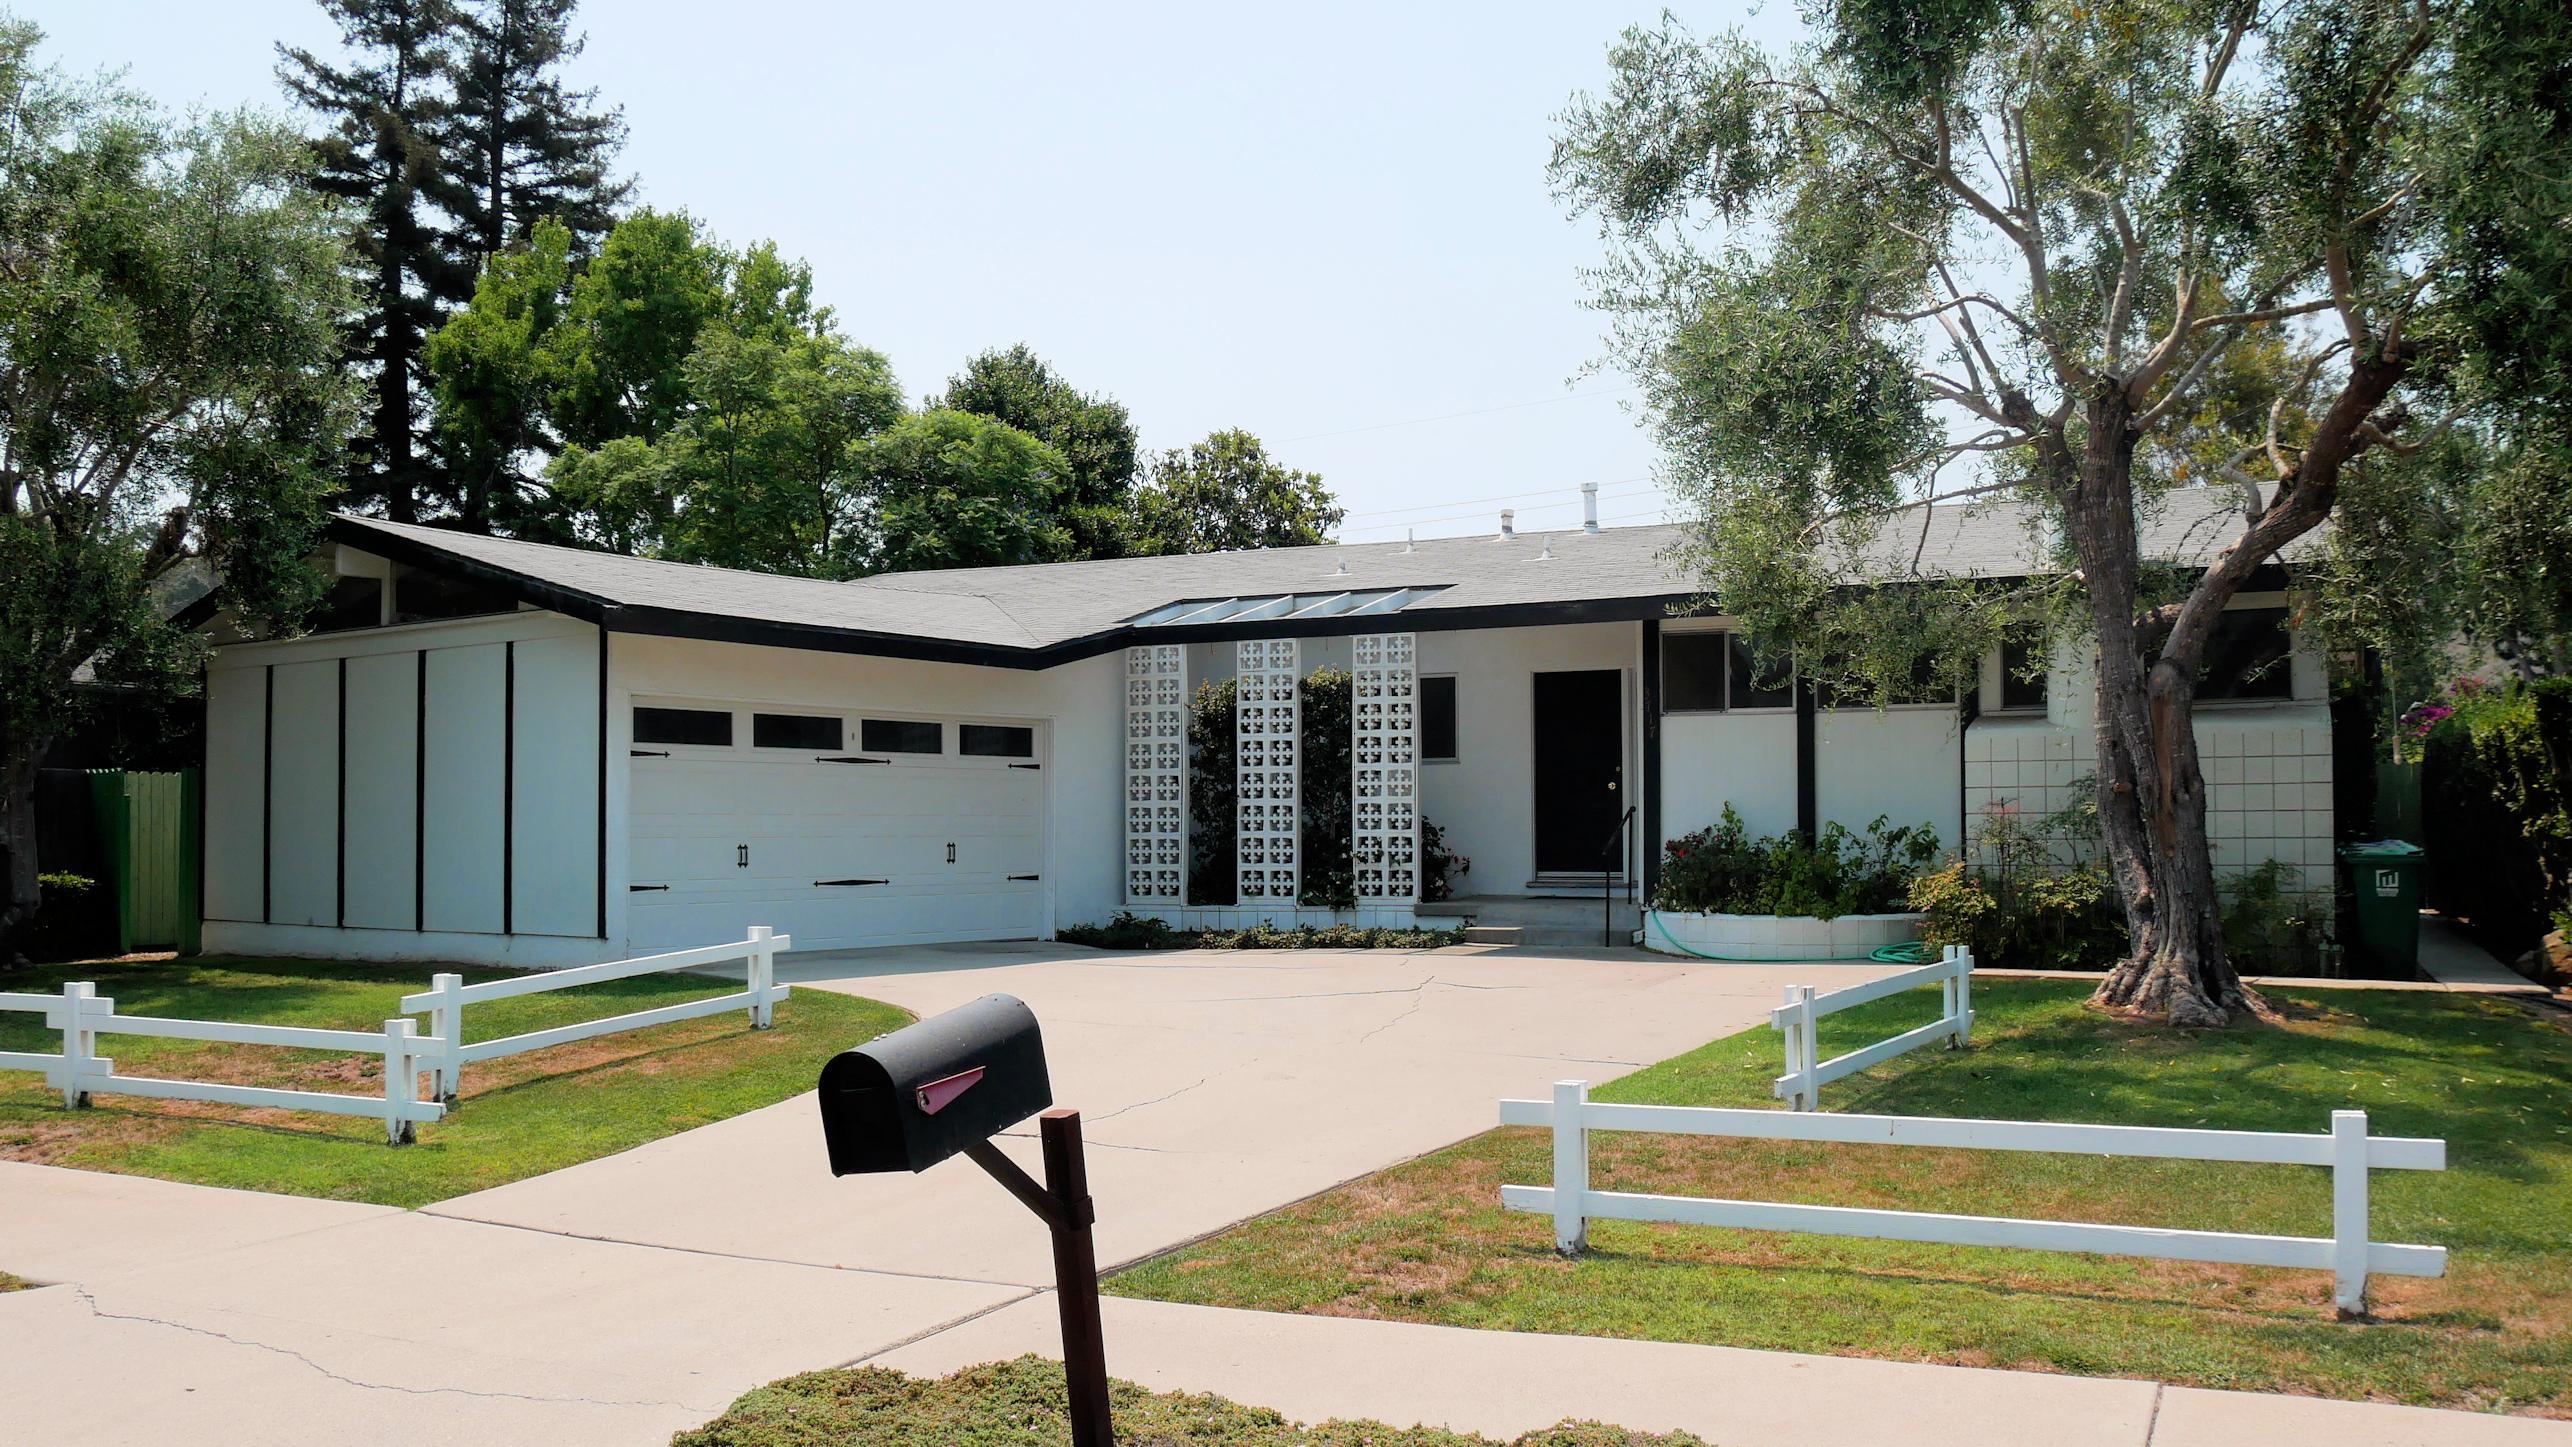 Property photo for 3717 Fortunato Way Santa Barbara, California 93105 - 18-3580